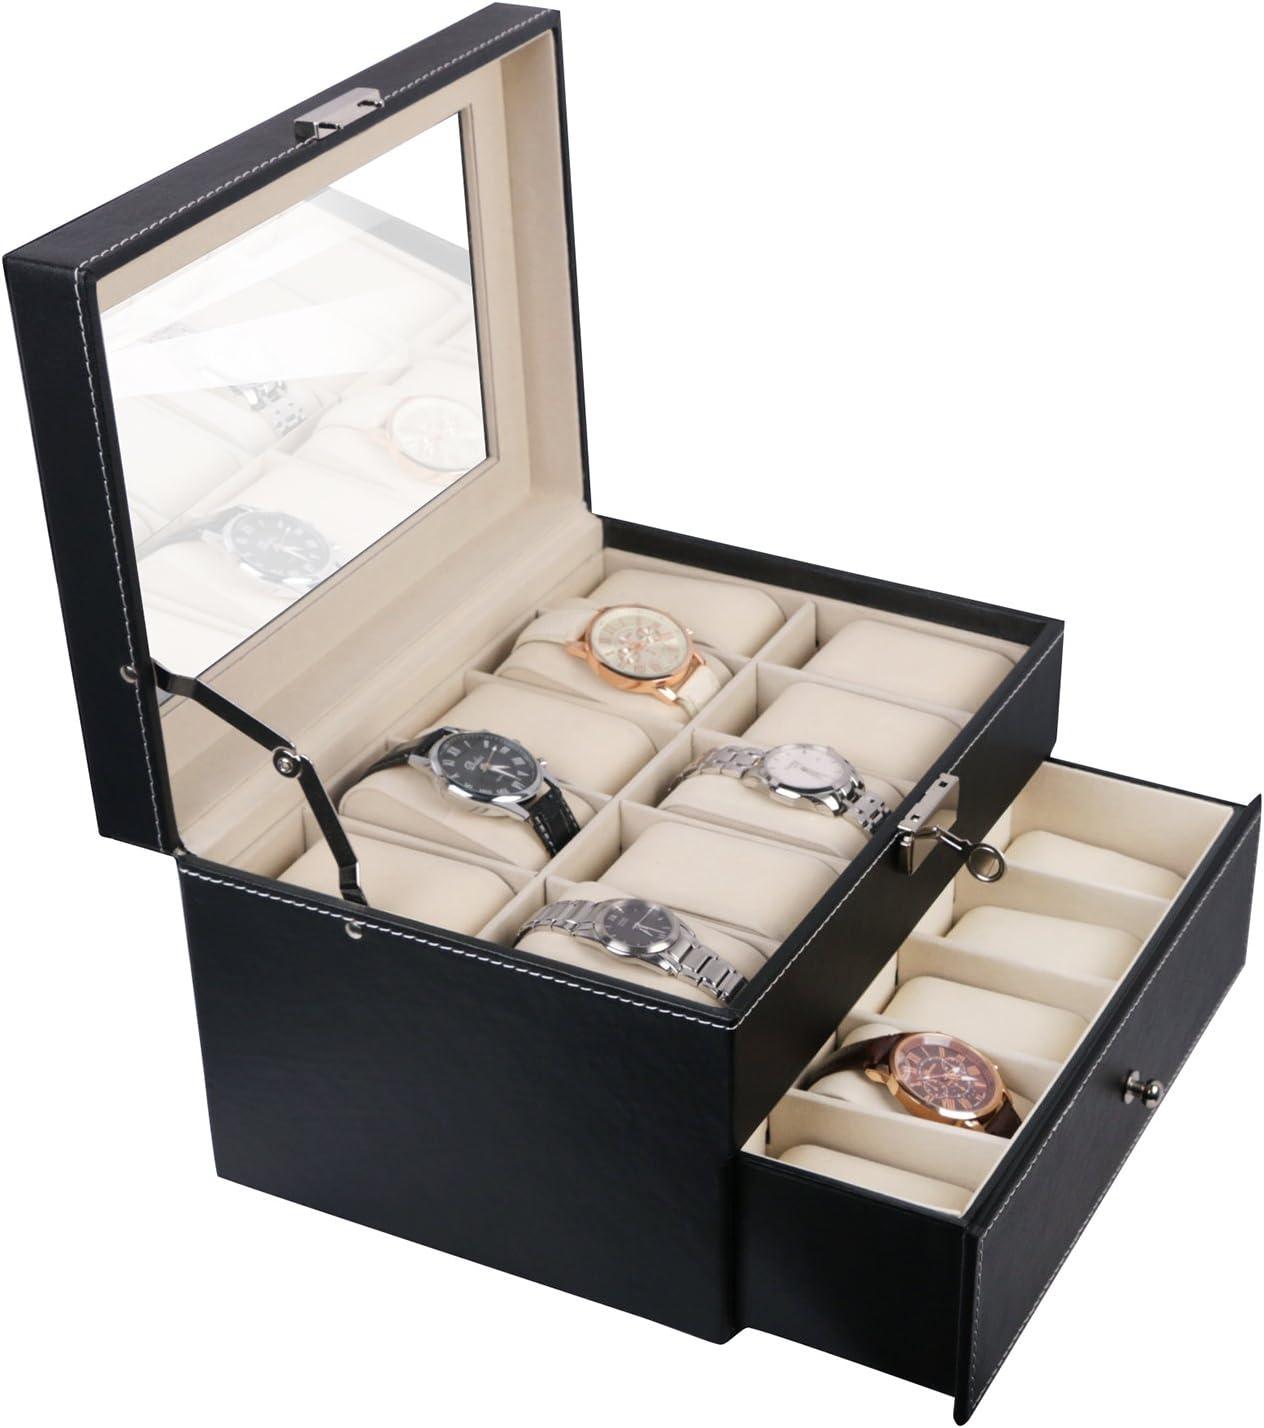 Vox Relojes Caja piel hombre negro reloj maletín Caja: Amazon.es: Joyería